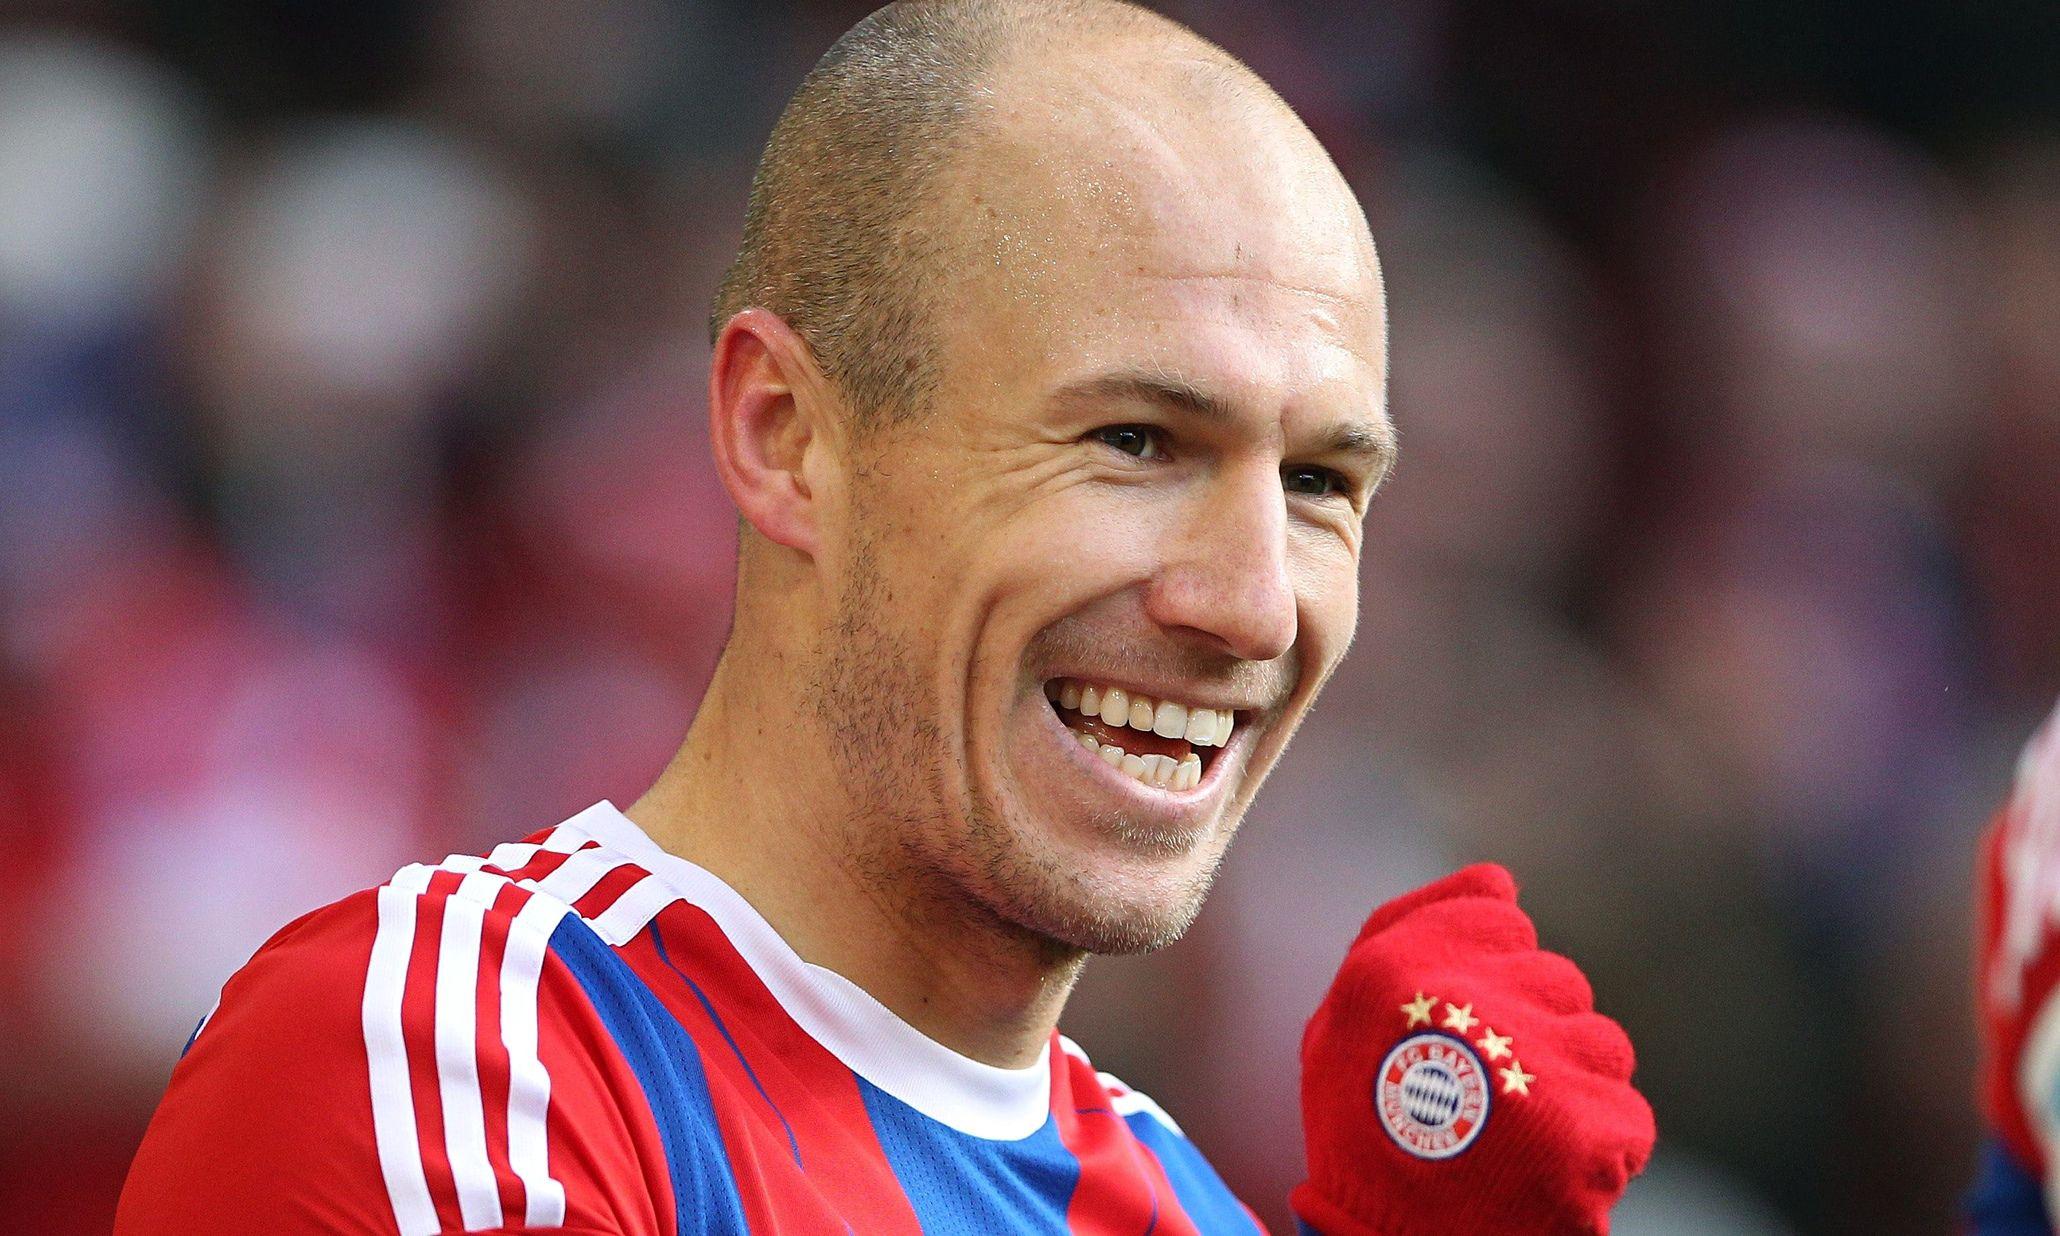 Arjen Robben Net Worth 2016 Http Www Tsmplug Com Football Gonzalo Higuain The Argentine Miracle Good Soccer Players Soccer Players Bayern Munich